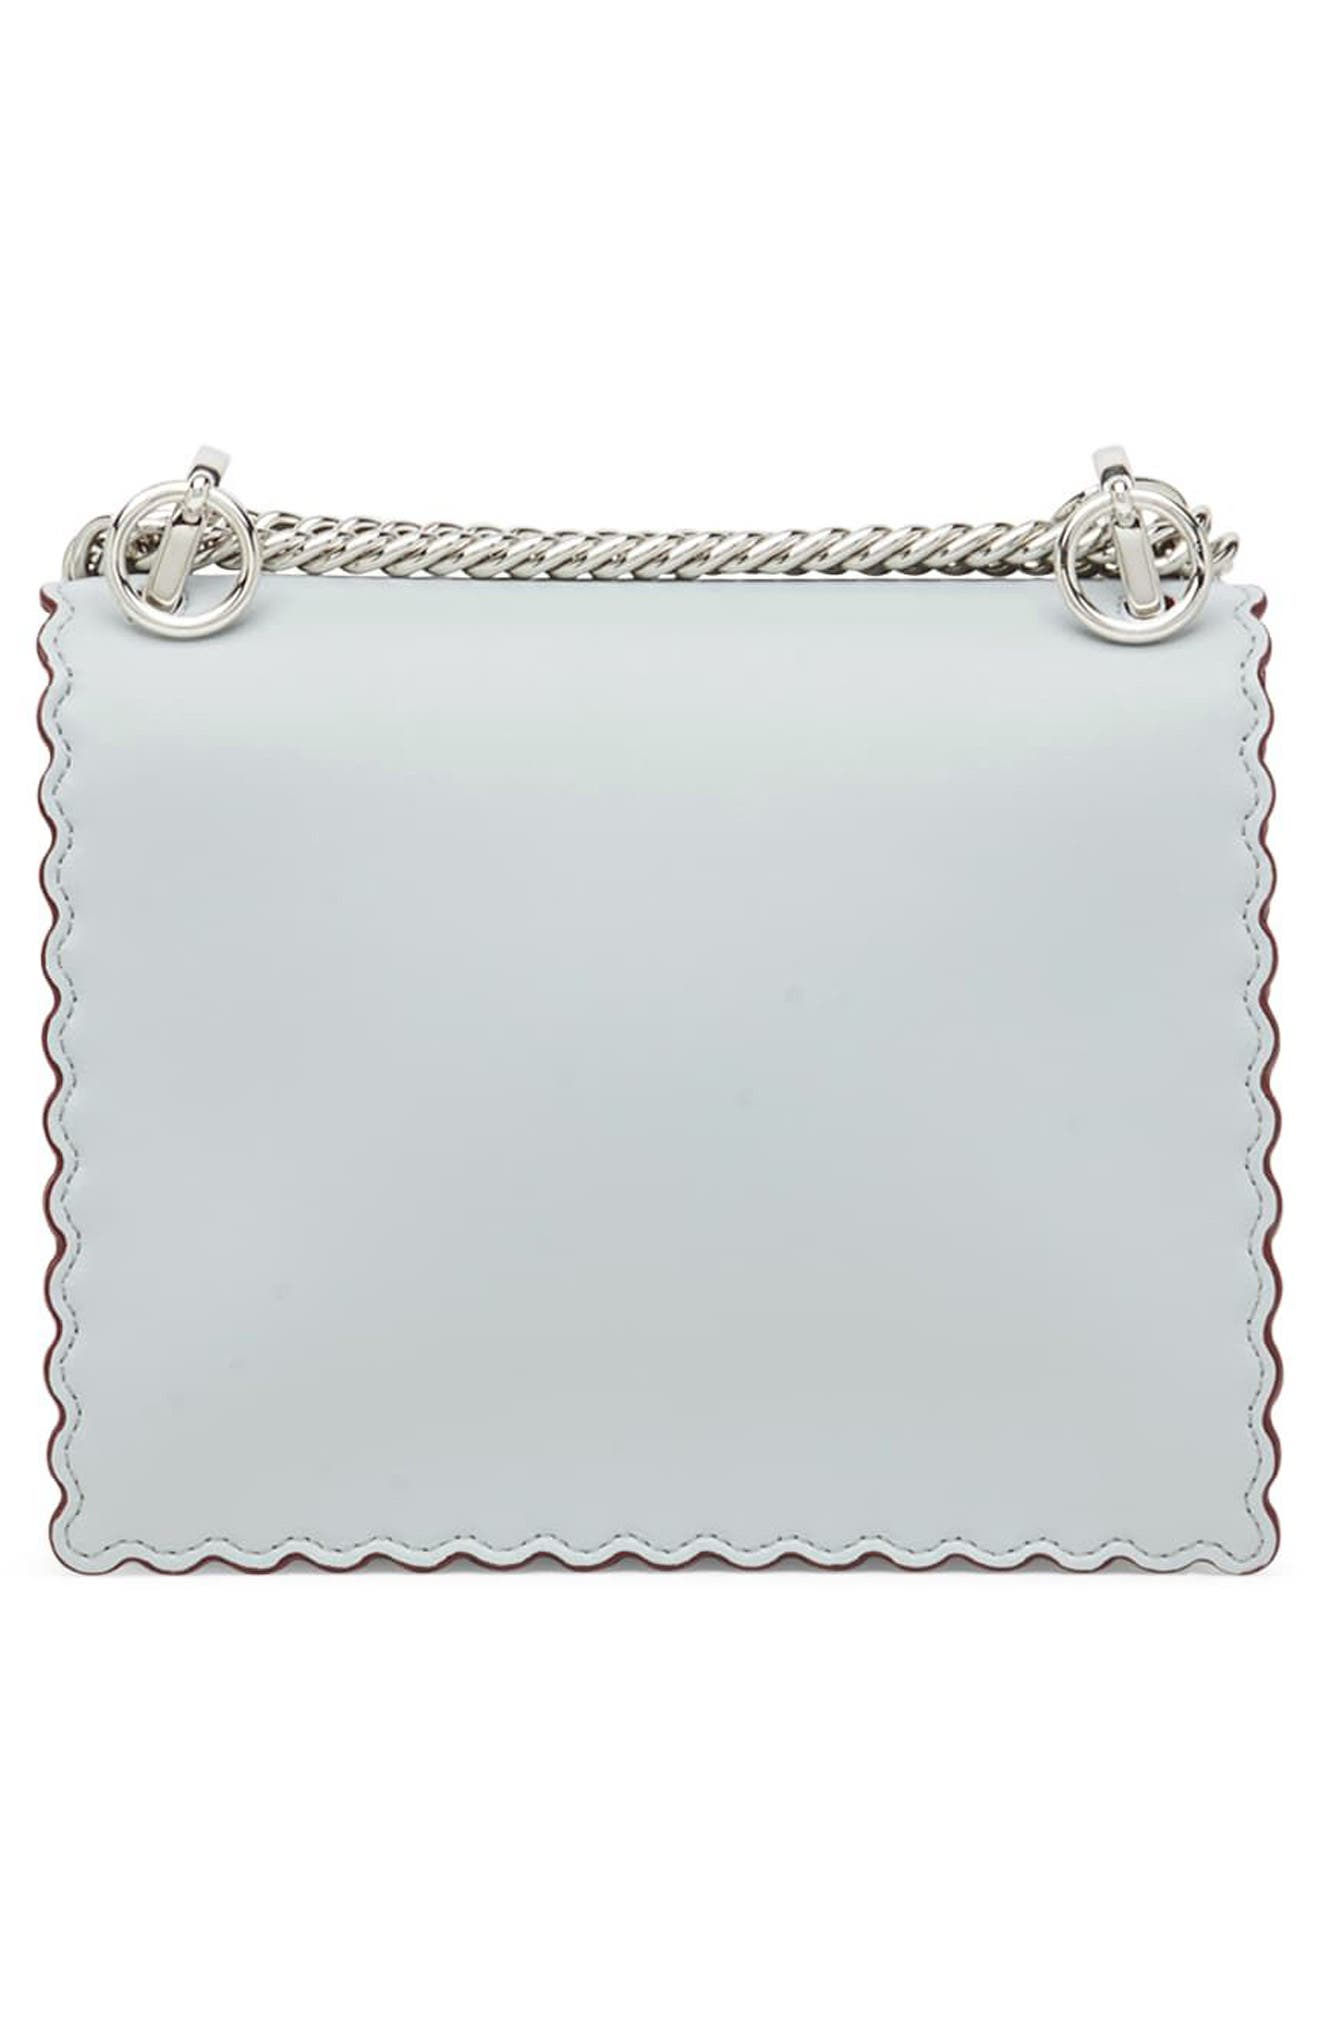 Mini Kan I Scalloped Leather Shoulder Bag,                             Alternate thumbnail 2, color,                             Grigio Perla/ Palladio